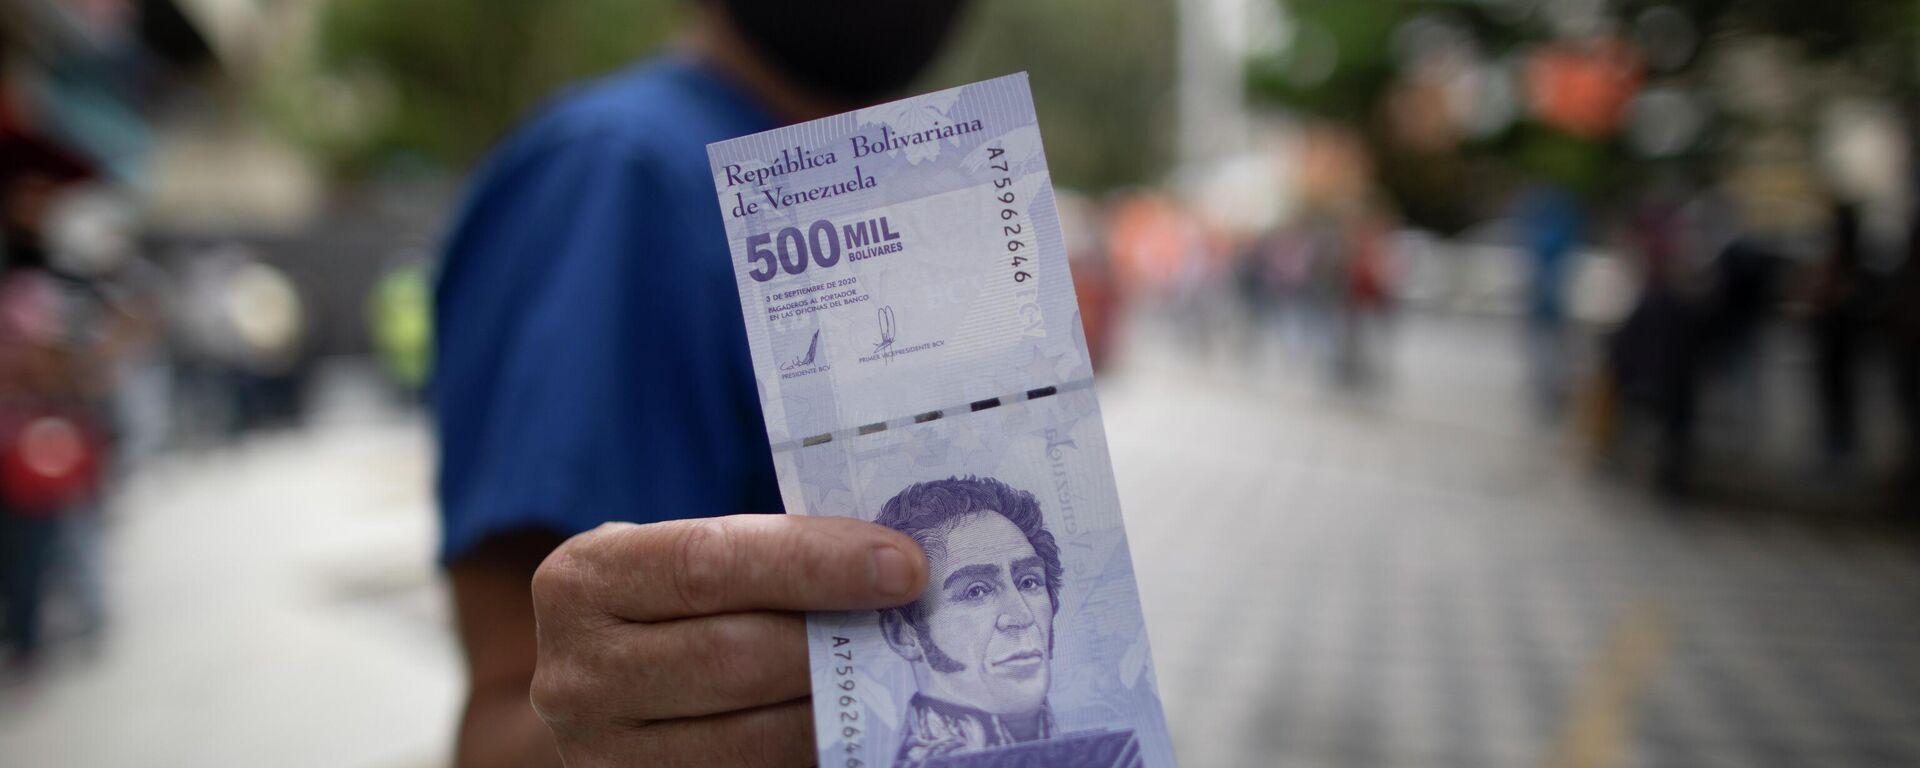 Un billete de 500 mil bolívares venezolanos - Sputnik Mundo, 1920, 25.04.2021